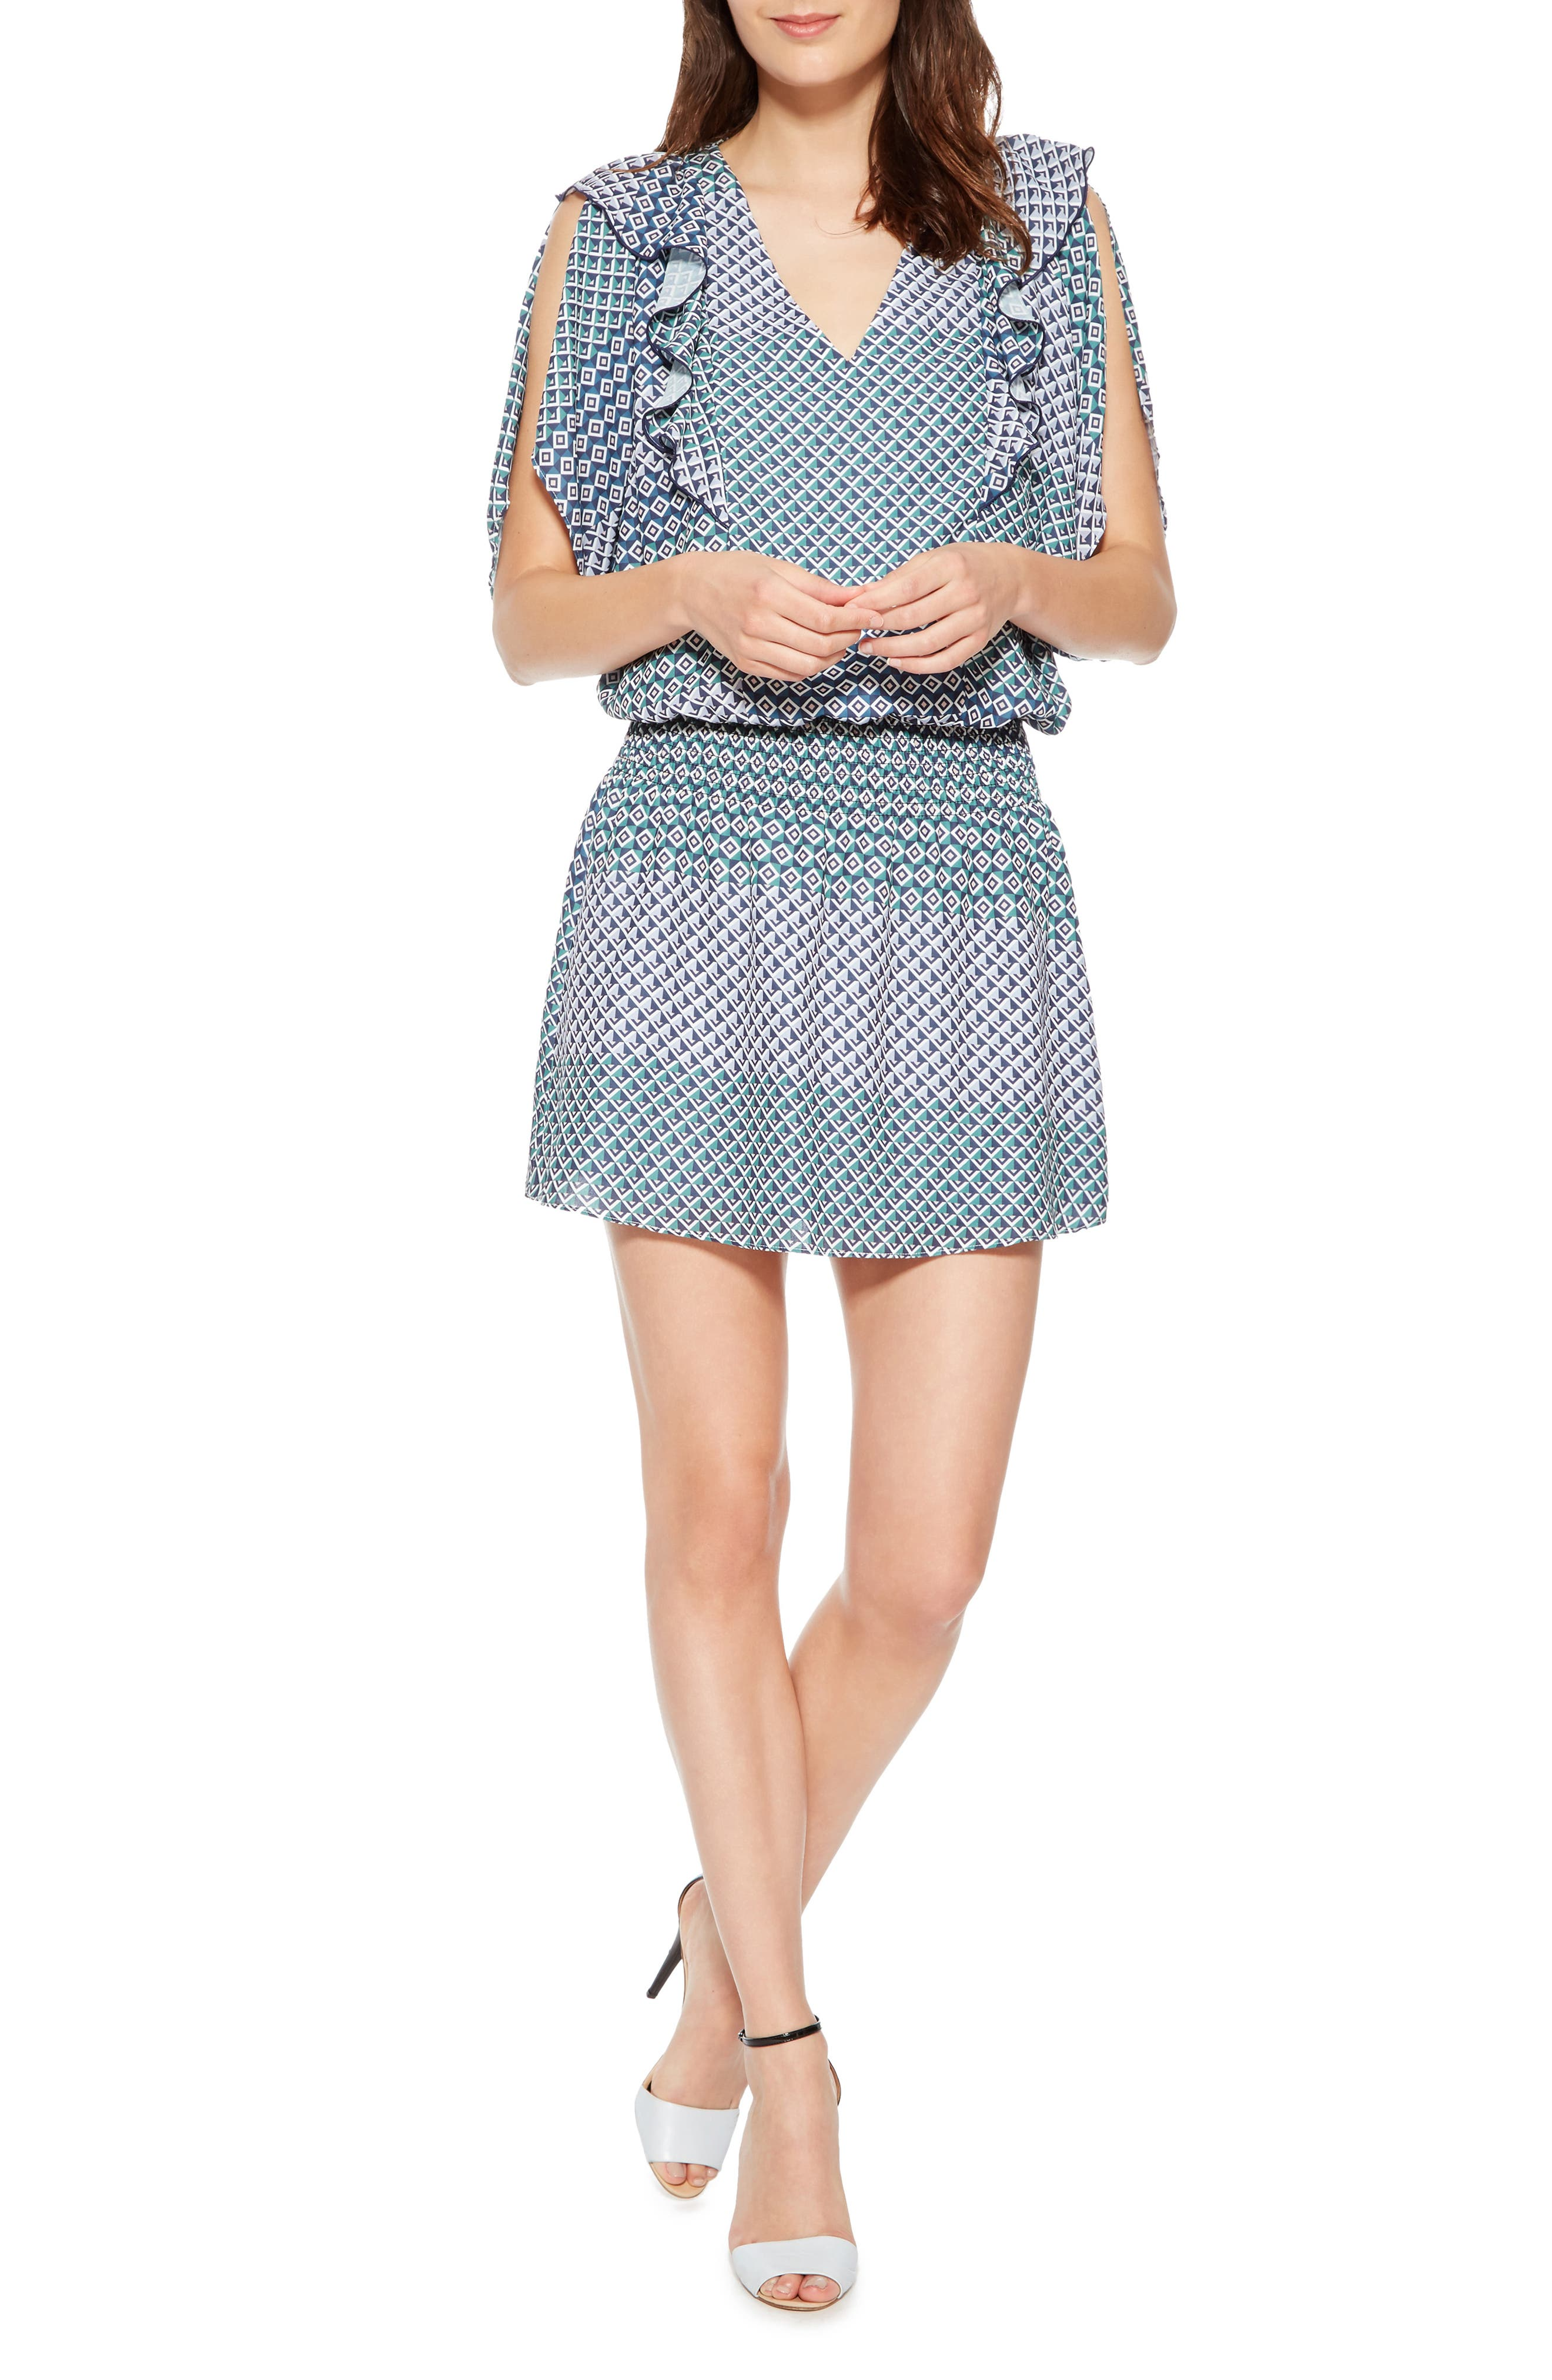 Luisa Print Dress,                             Main thumbnail 1, color,                             CESE